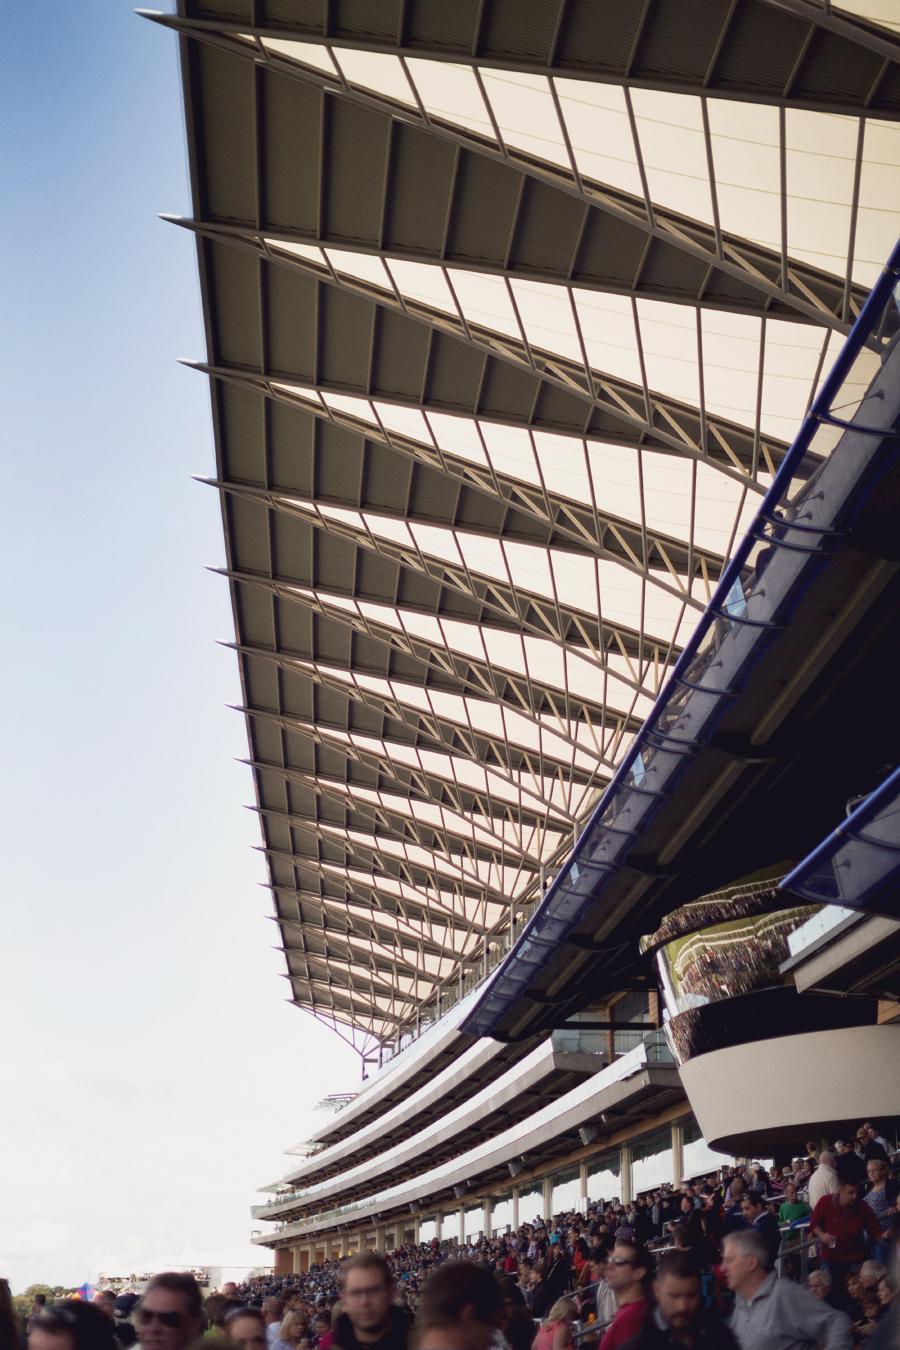 Ascot Racecourse, Windsor